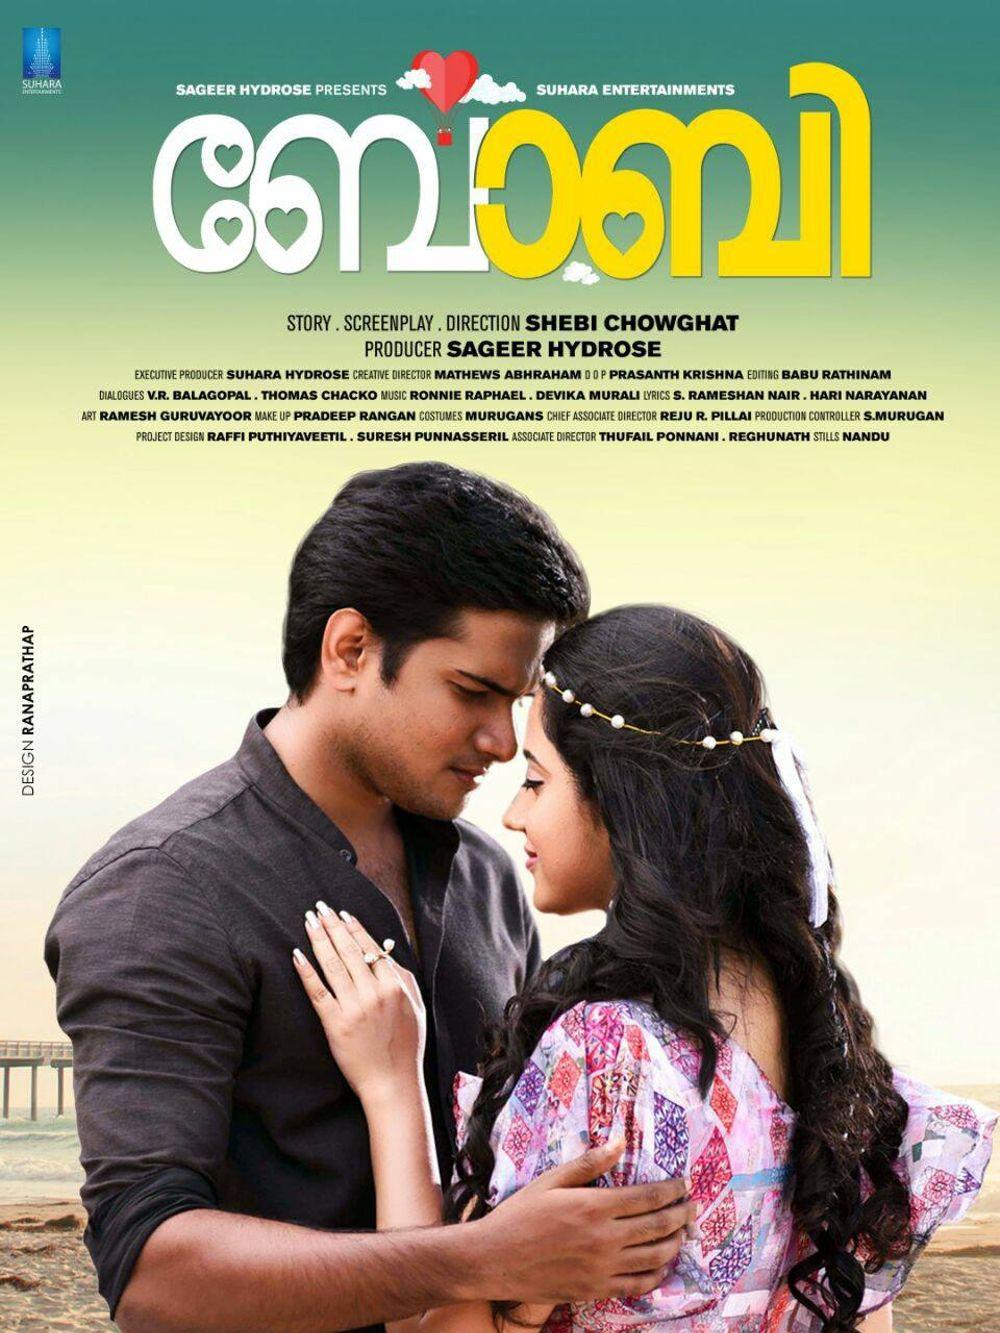 Bobby (Malayalam) Movie Review